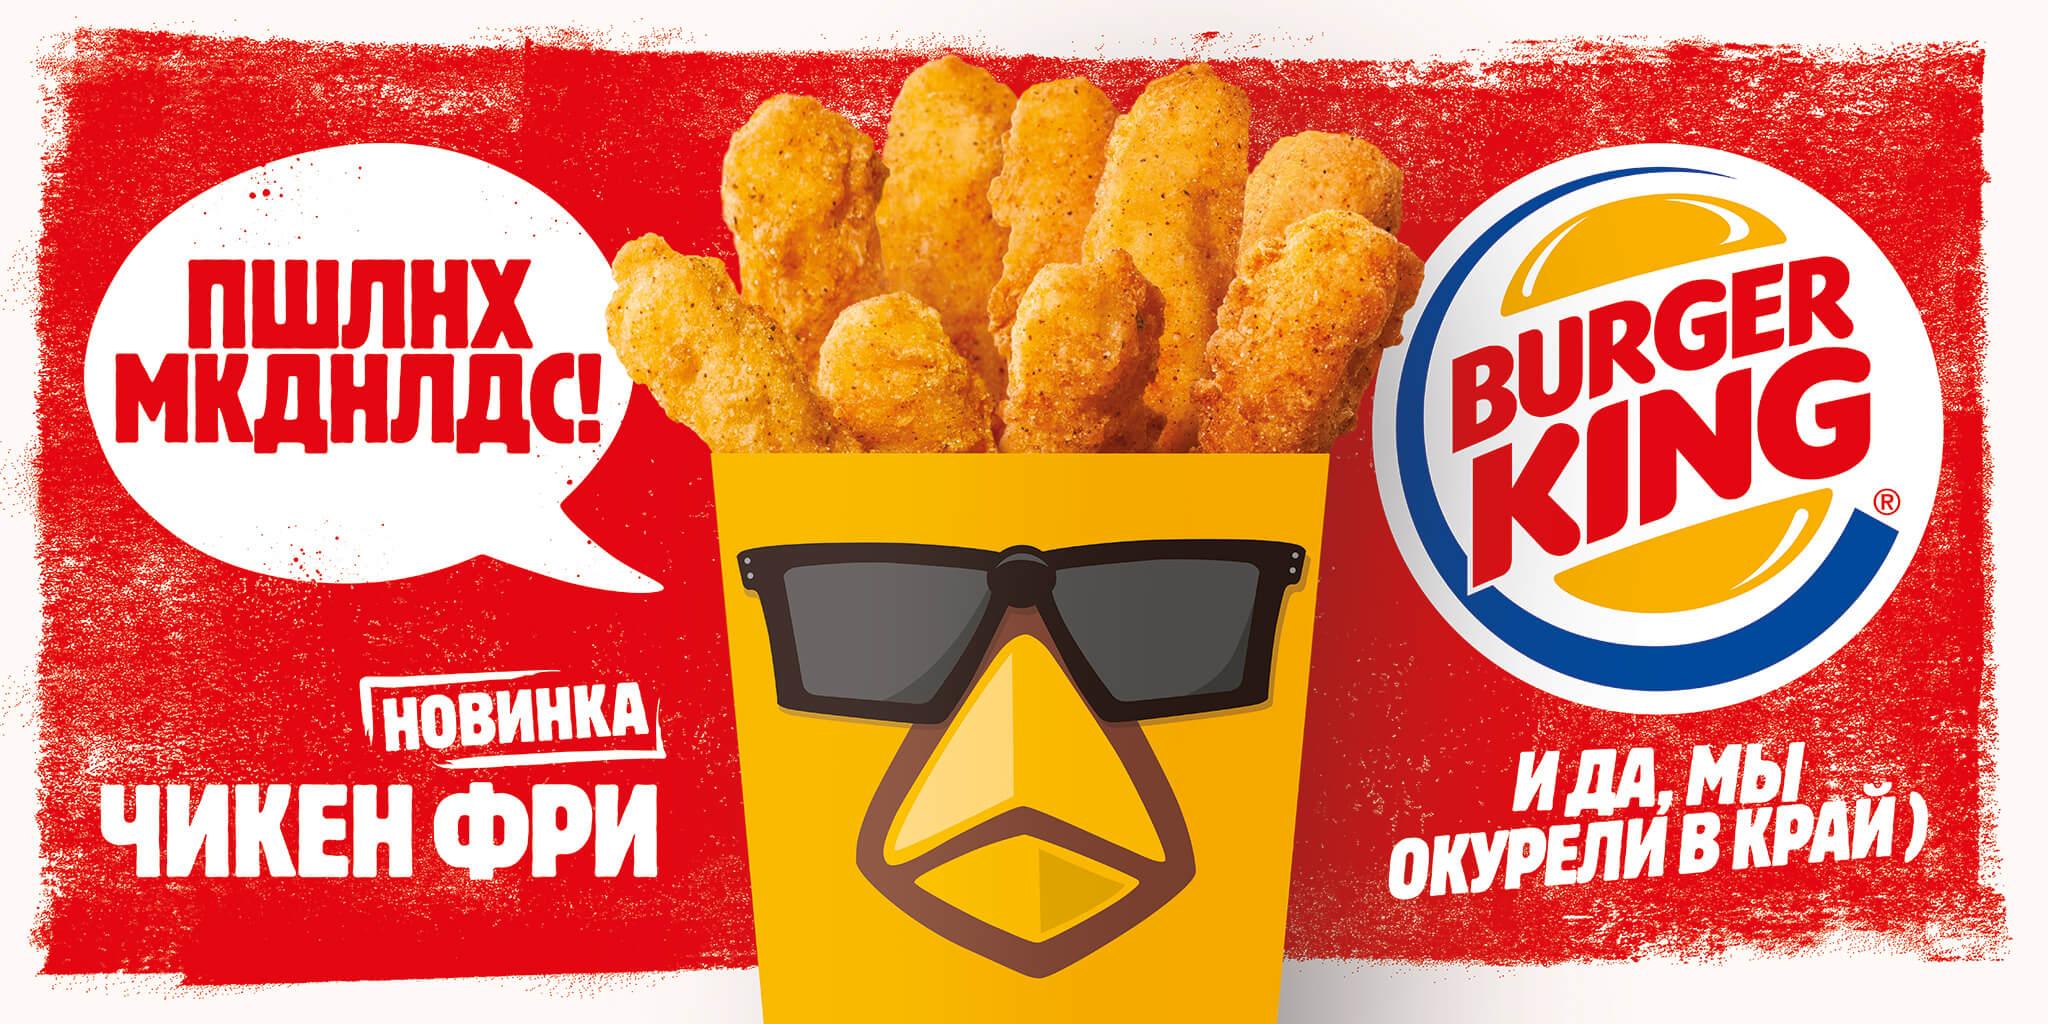 Троллинг от Burger King